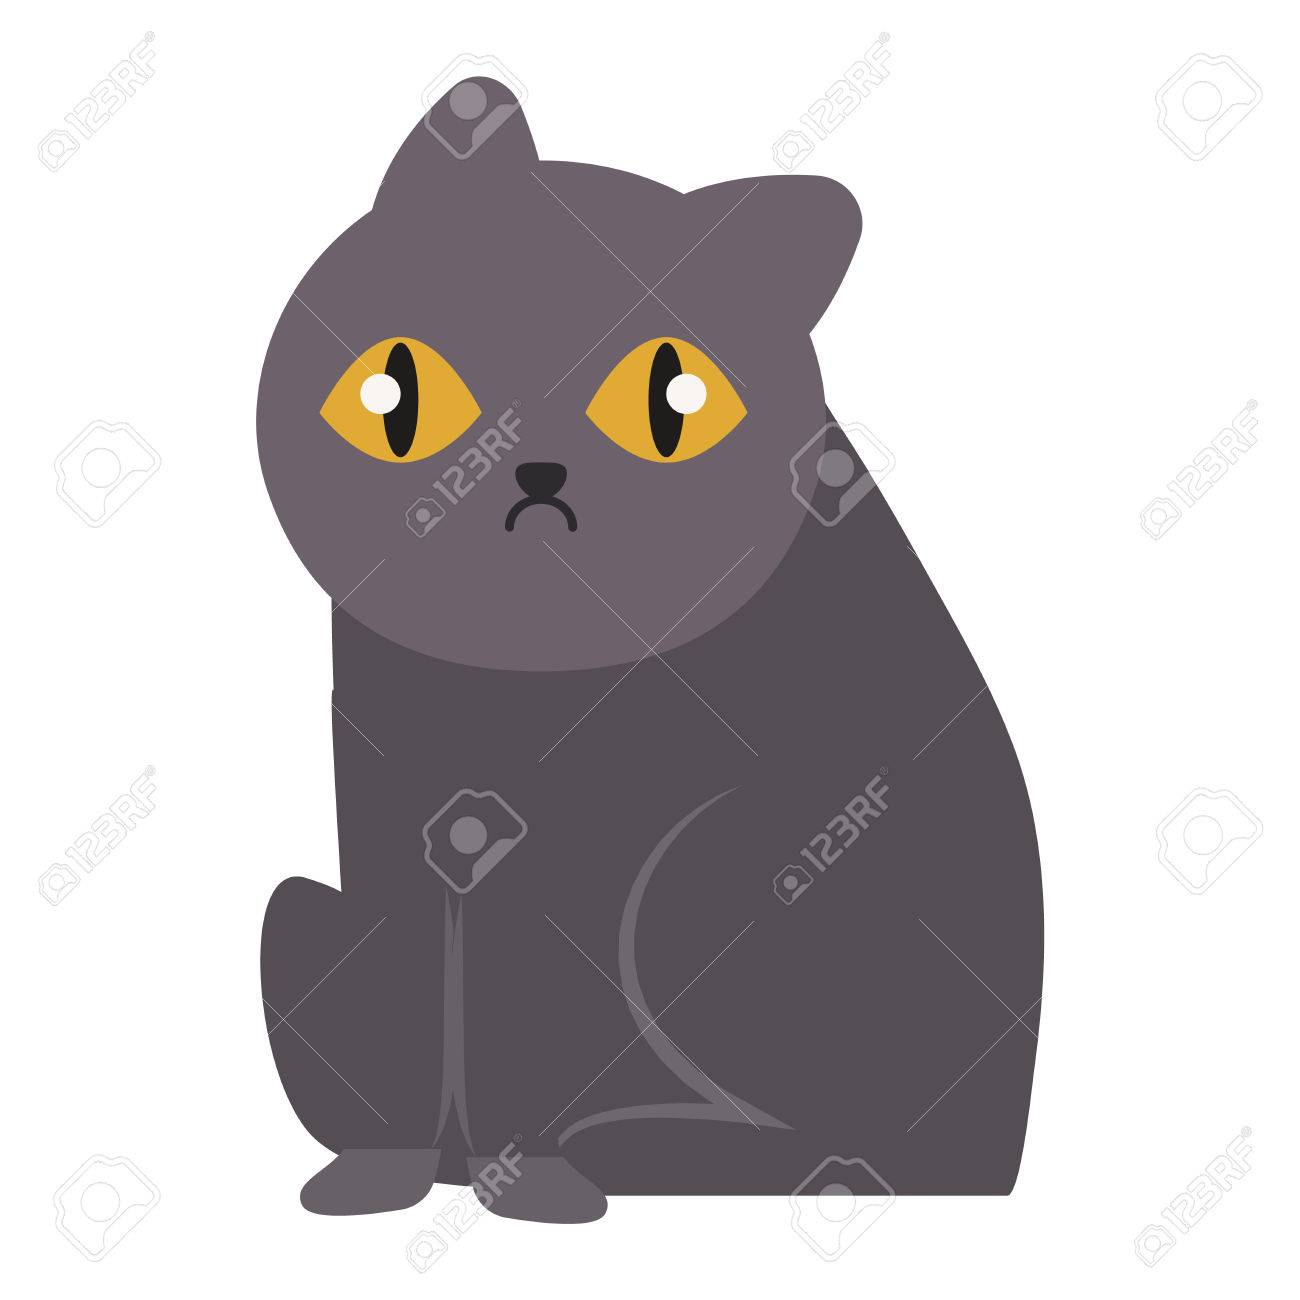 noir chatte